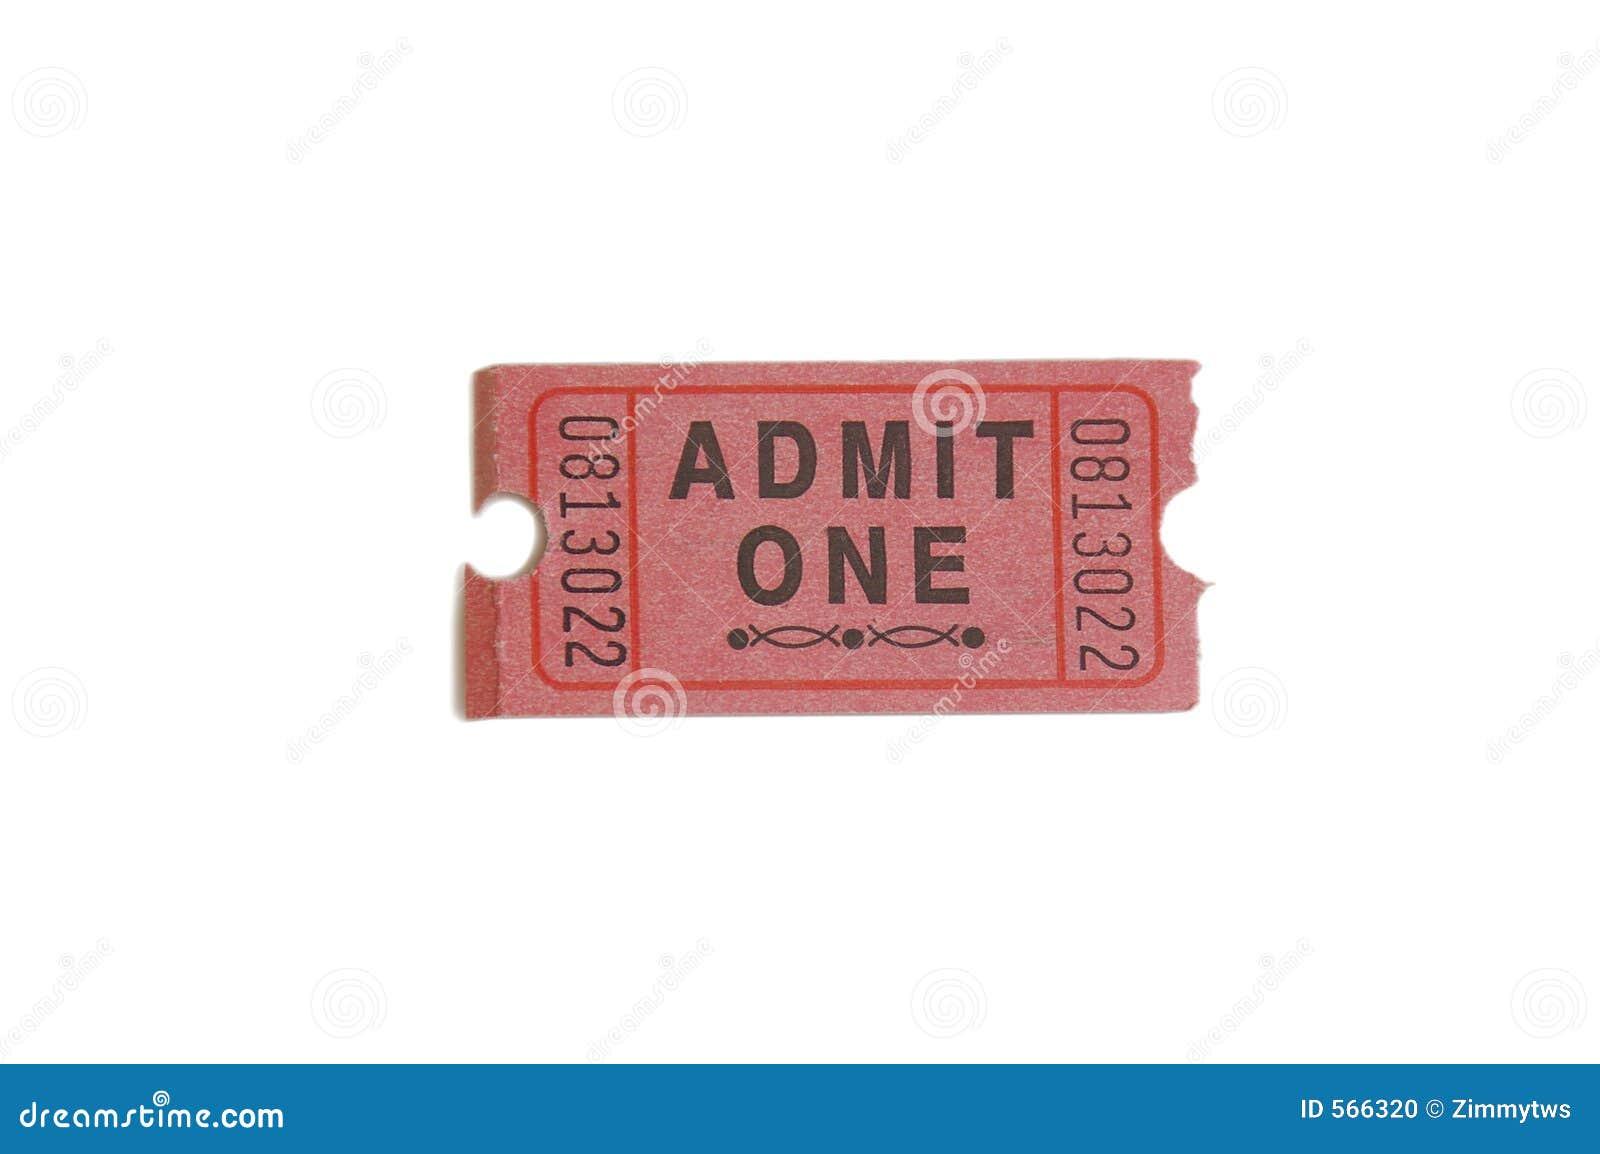 ticket stub stock photo